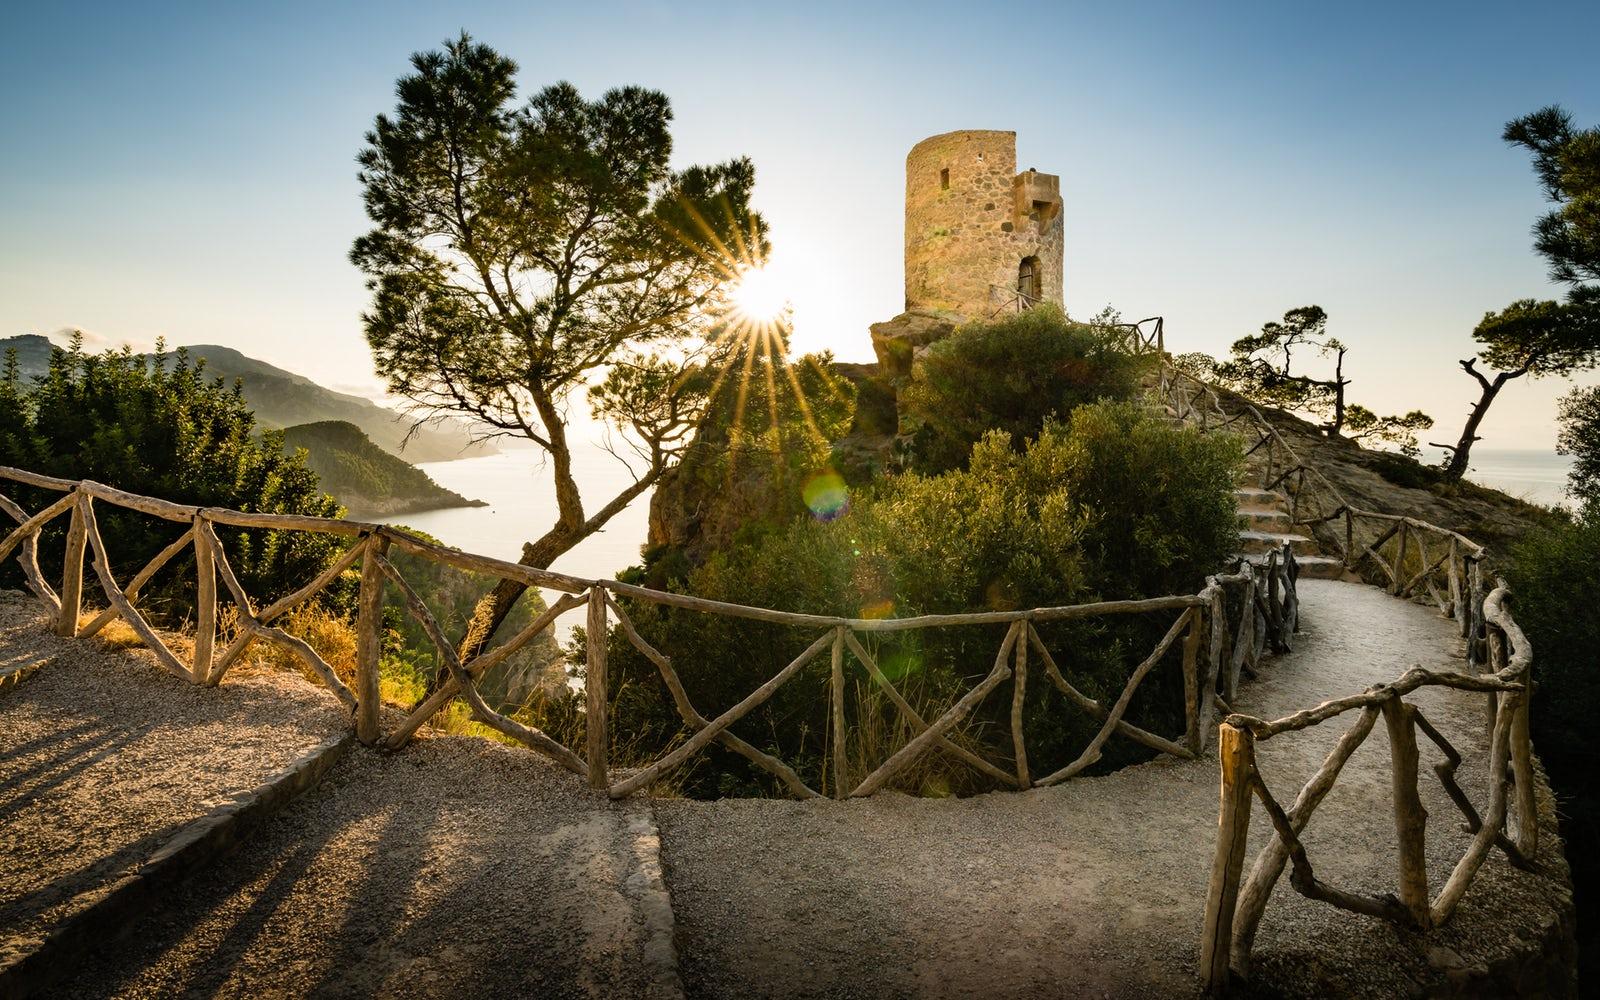 Torre des verger, Mallorca